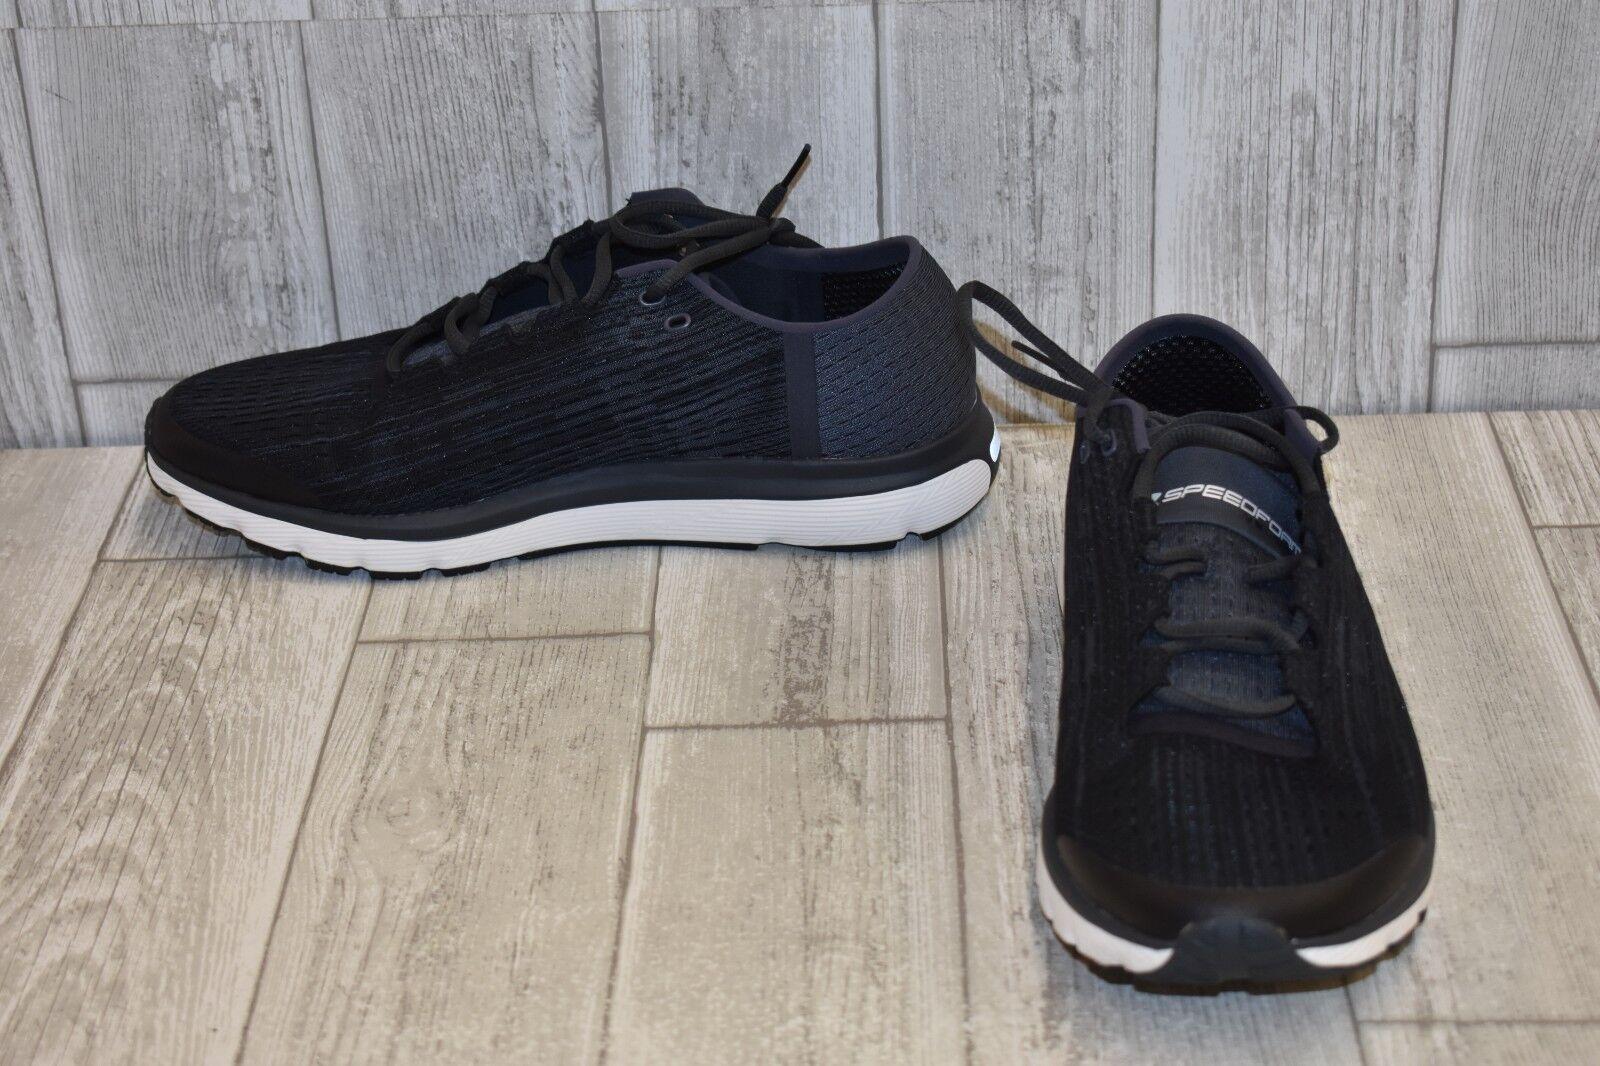 Under Armour Speed Form Running 12 Chaussures - hommes Taille 12 Running noir e46d8a